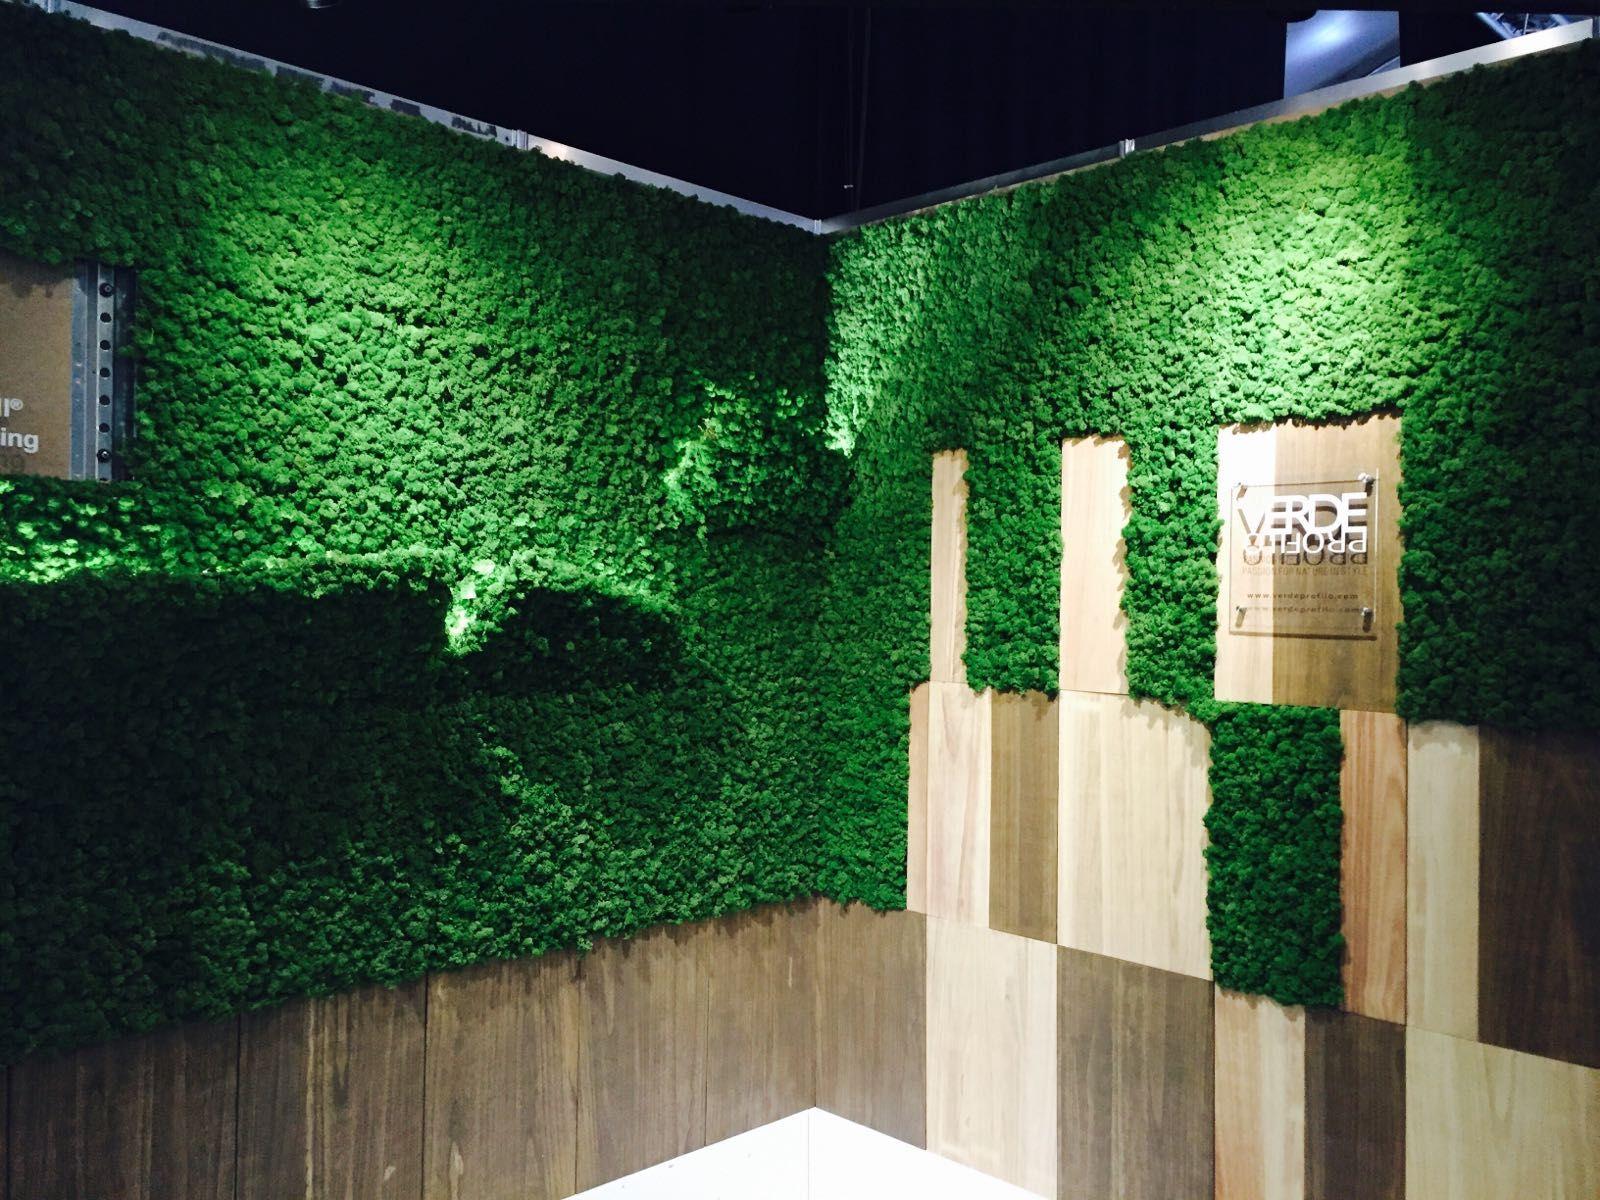 Deko In Natur Optik Rinde Moos Vertikal Garten Design: Deko Wohnzimmer